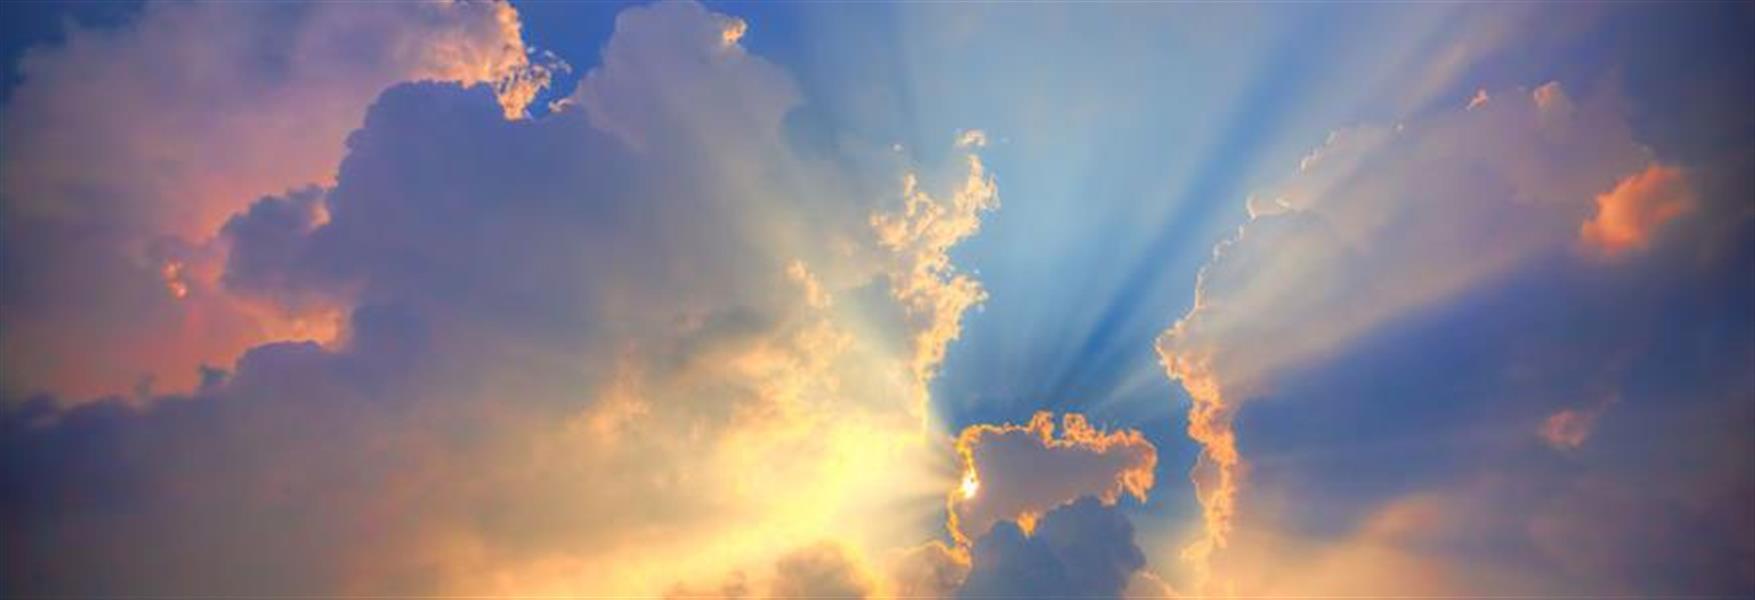 b9ace7eb-a403-4f01-9e8a-28d0ada25d25_light-bursting-from-cloudssunrays-beam-of-light-clouds.jpg